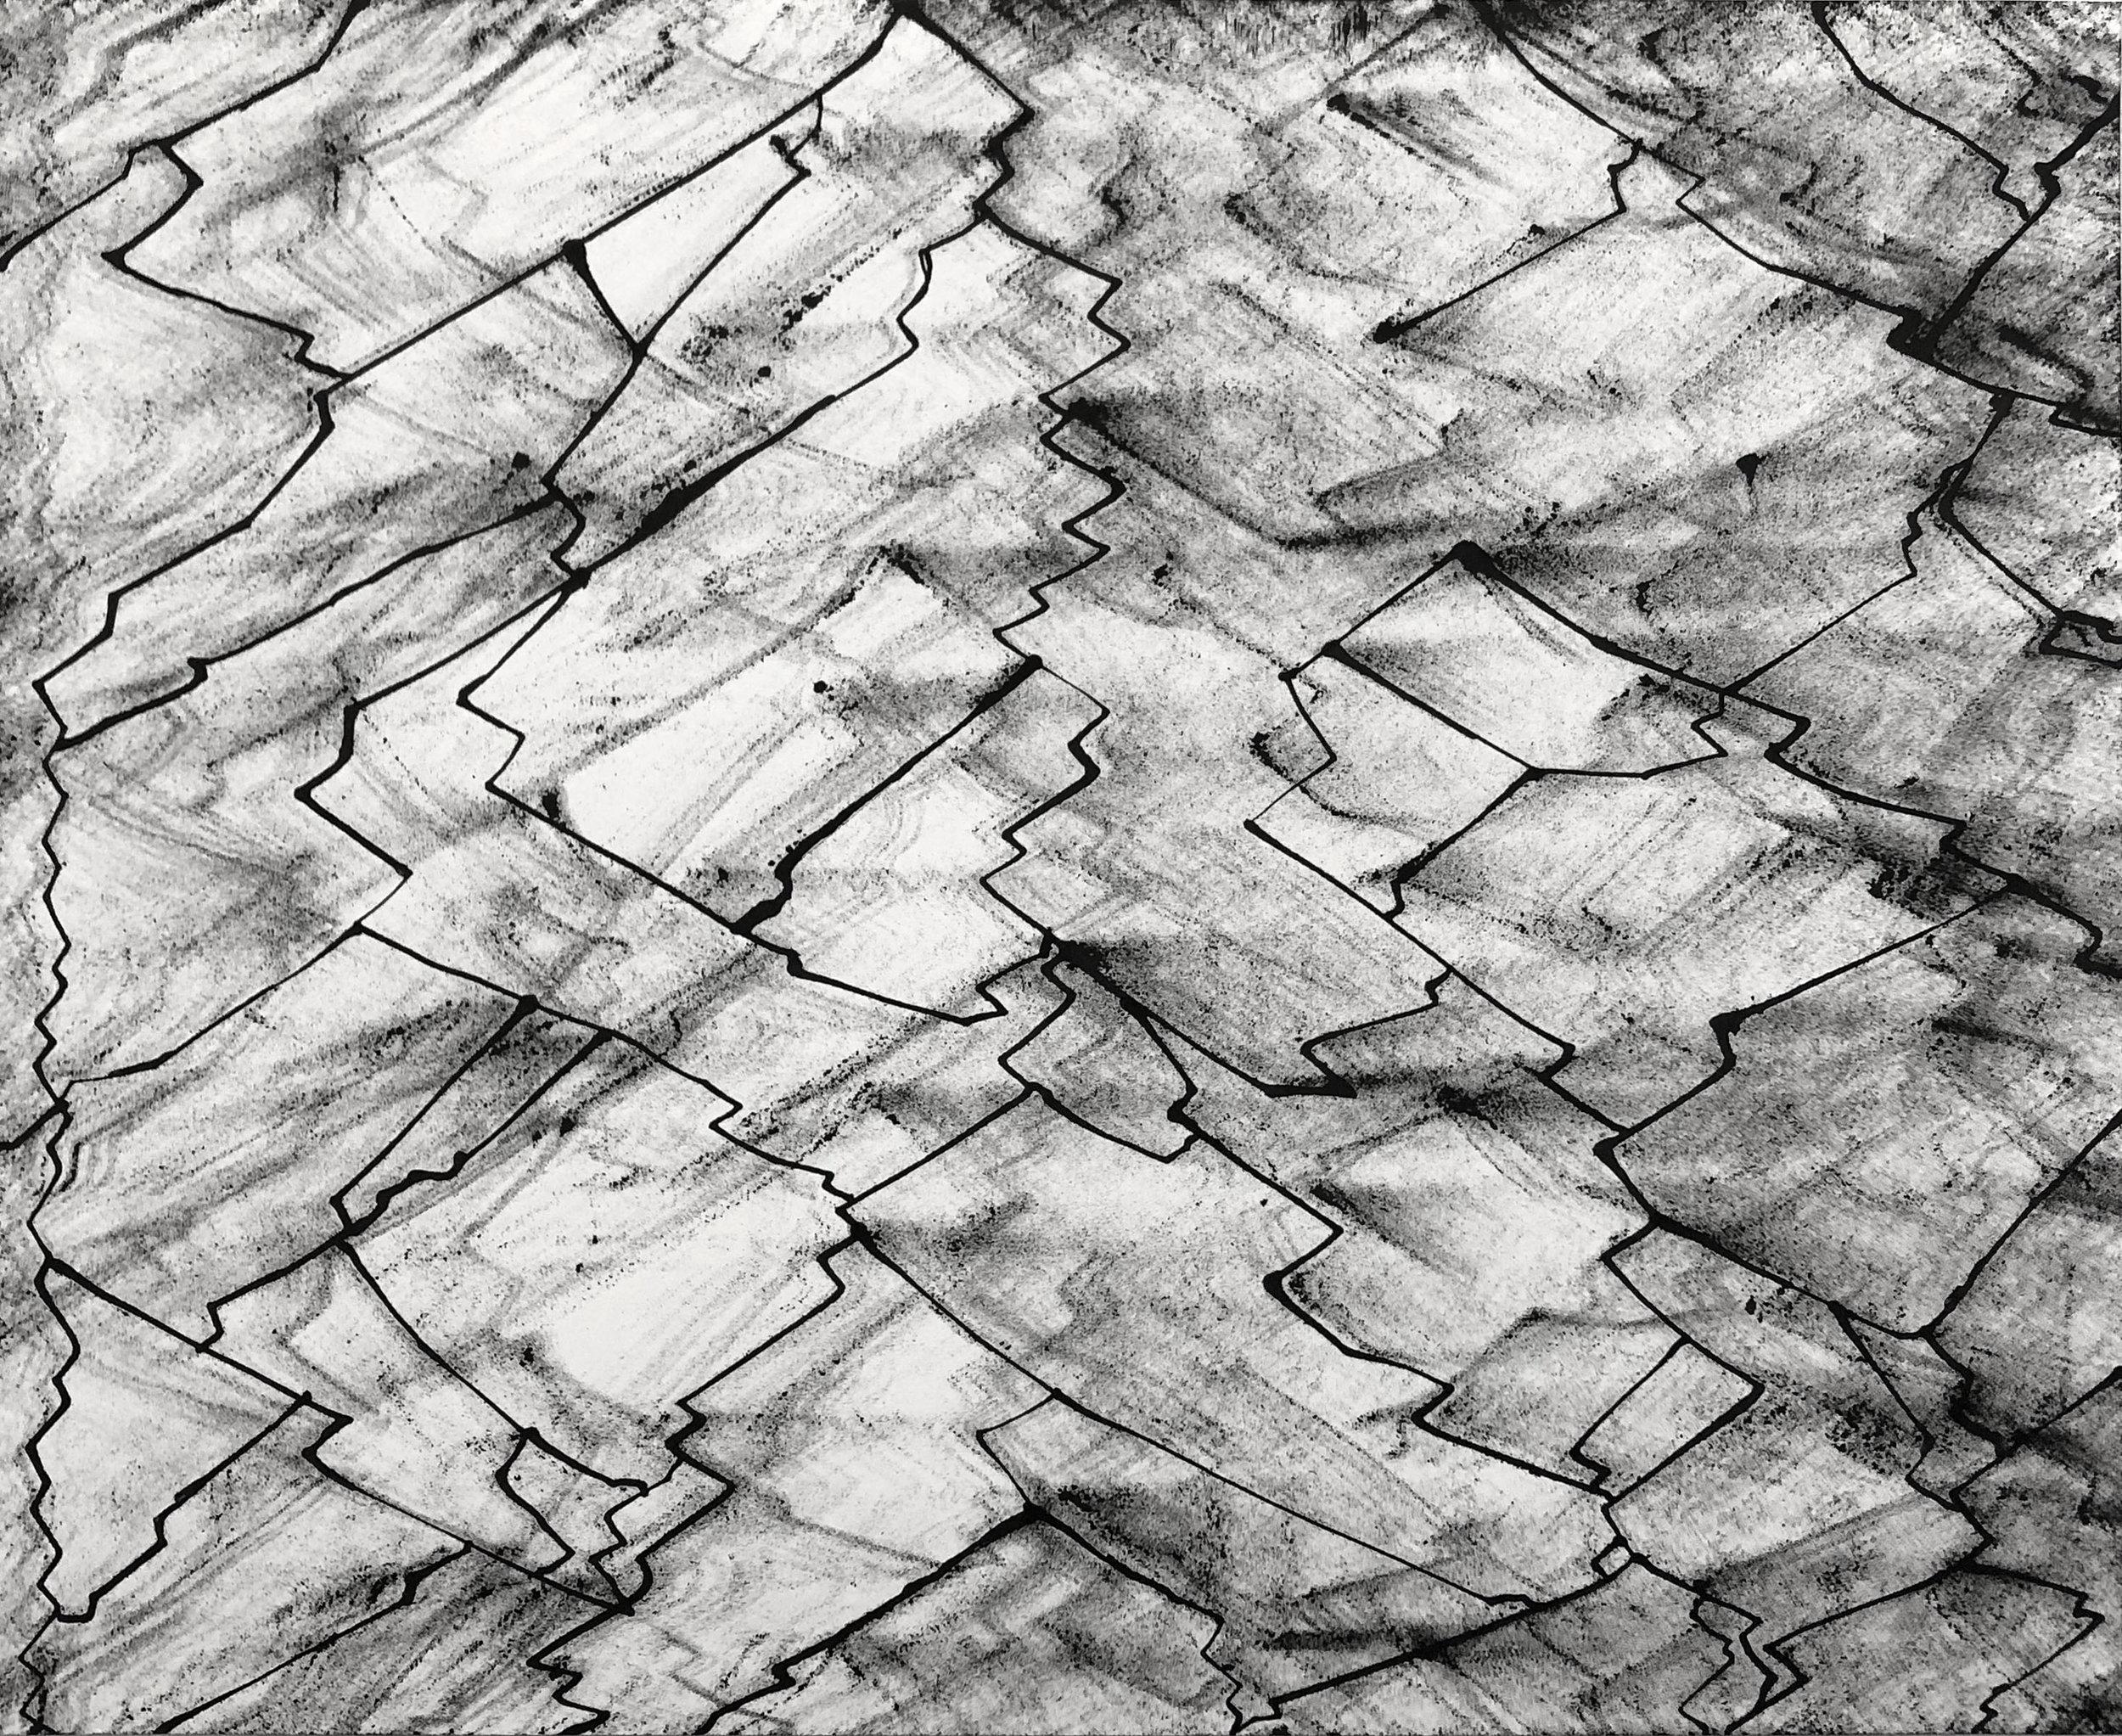 Plea, 14x17, Ink on Paper